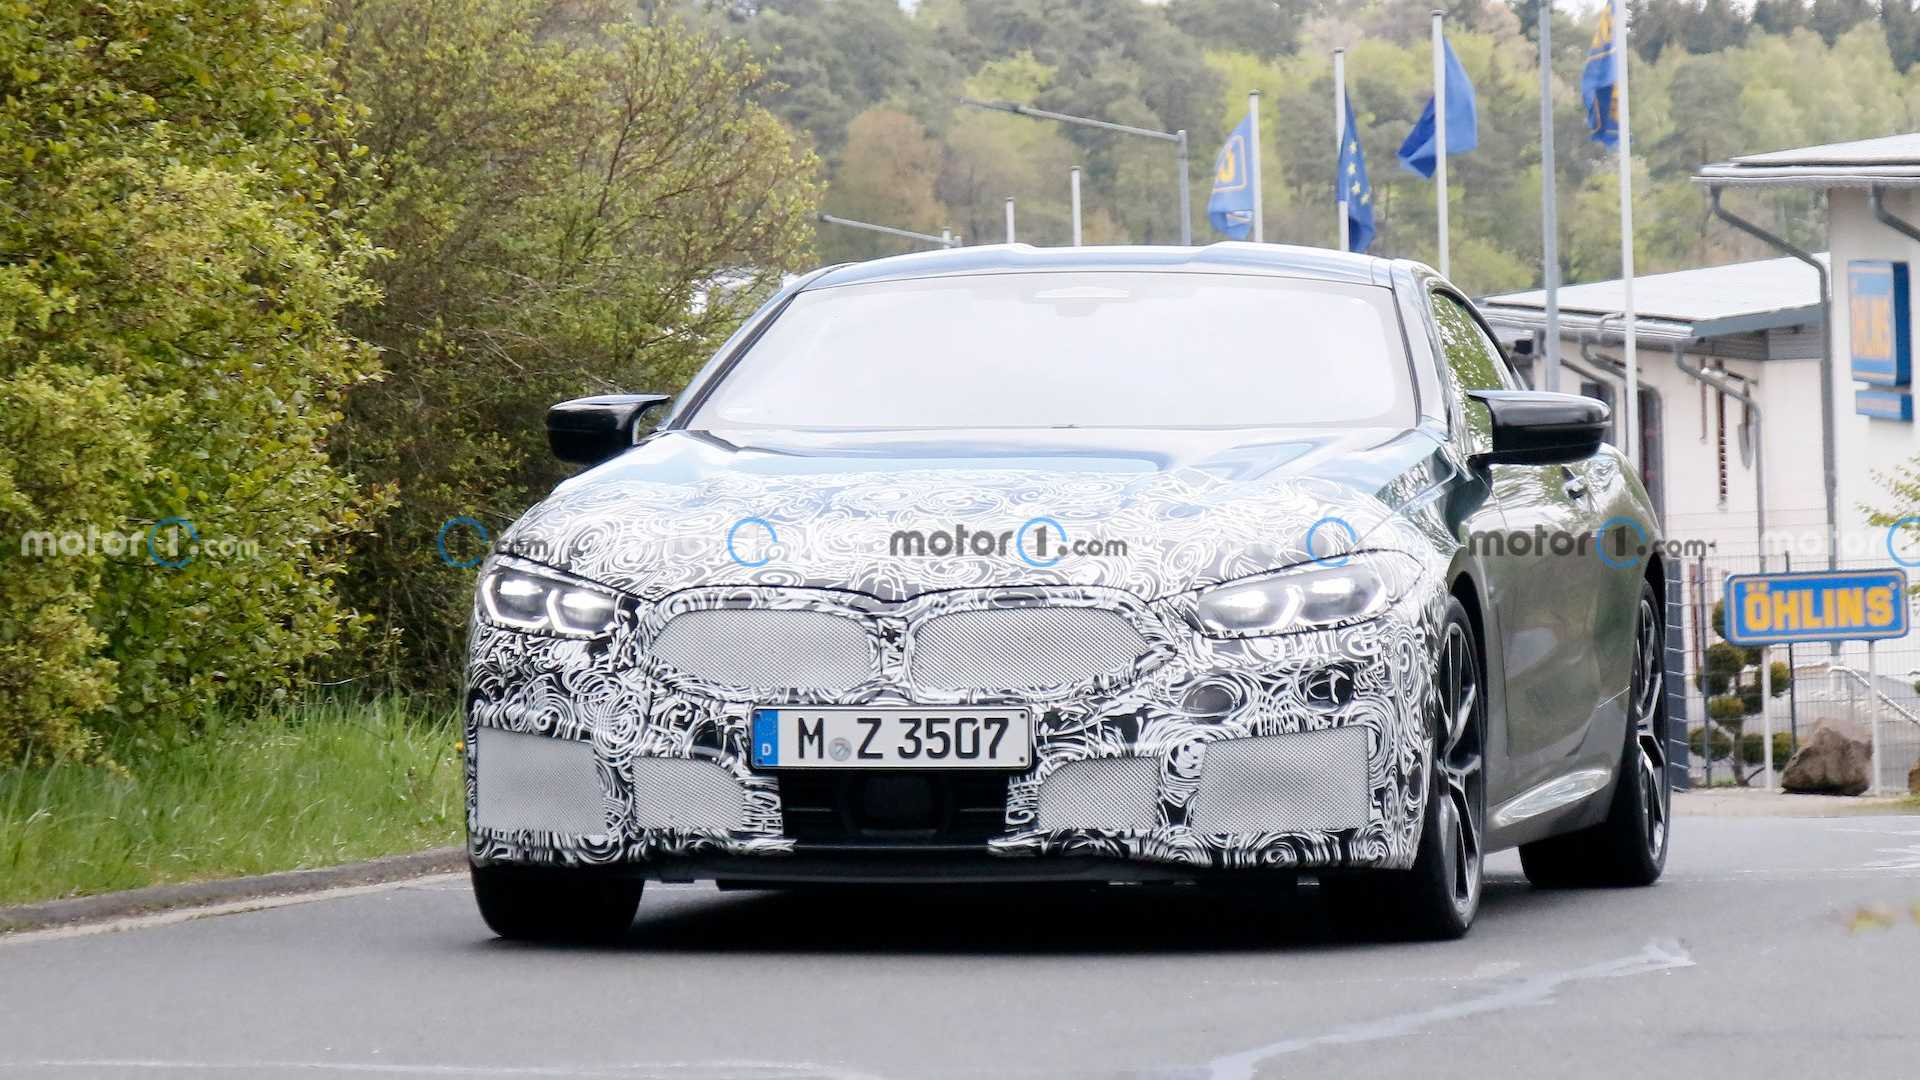 BMW 8 Series Coupe Facelift Spy Photos (Exterior & Interior)